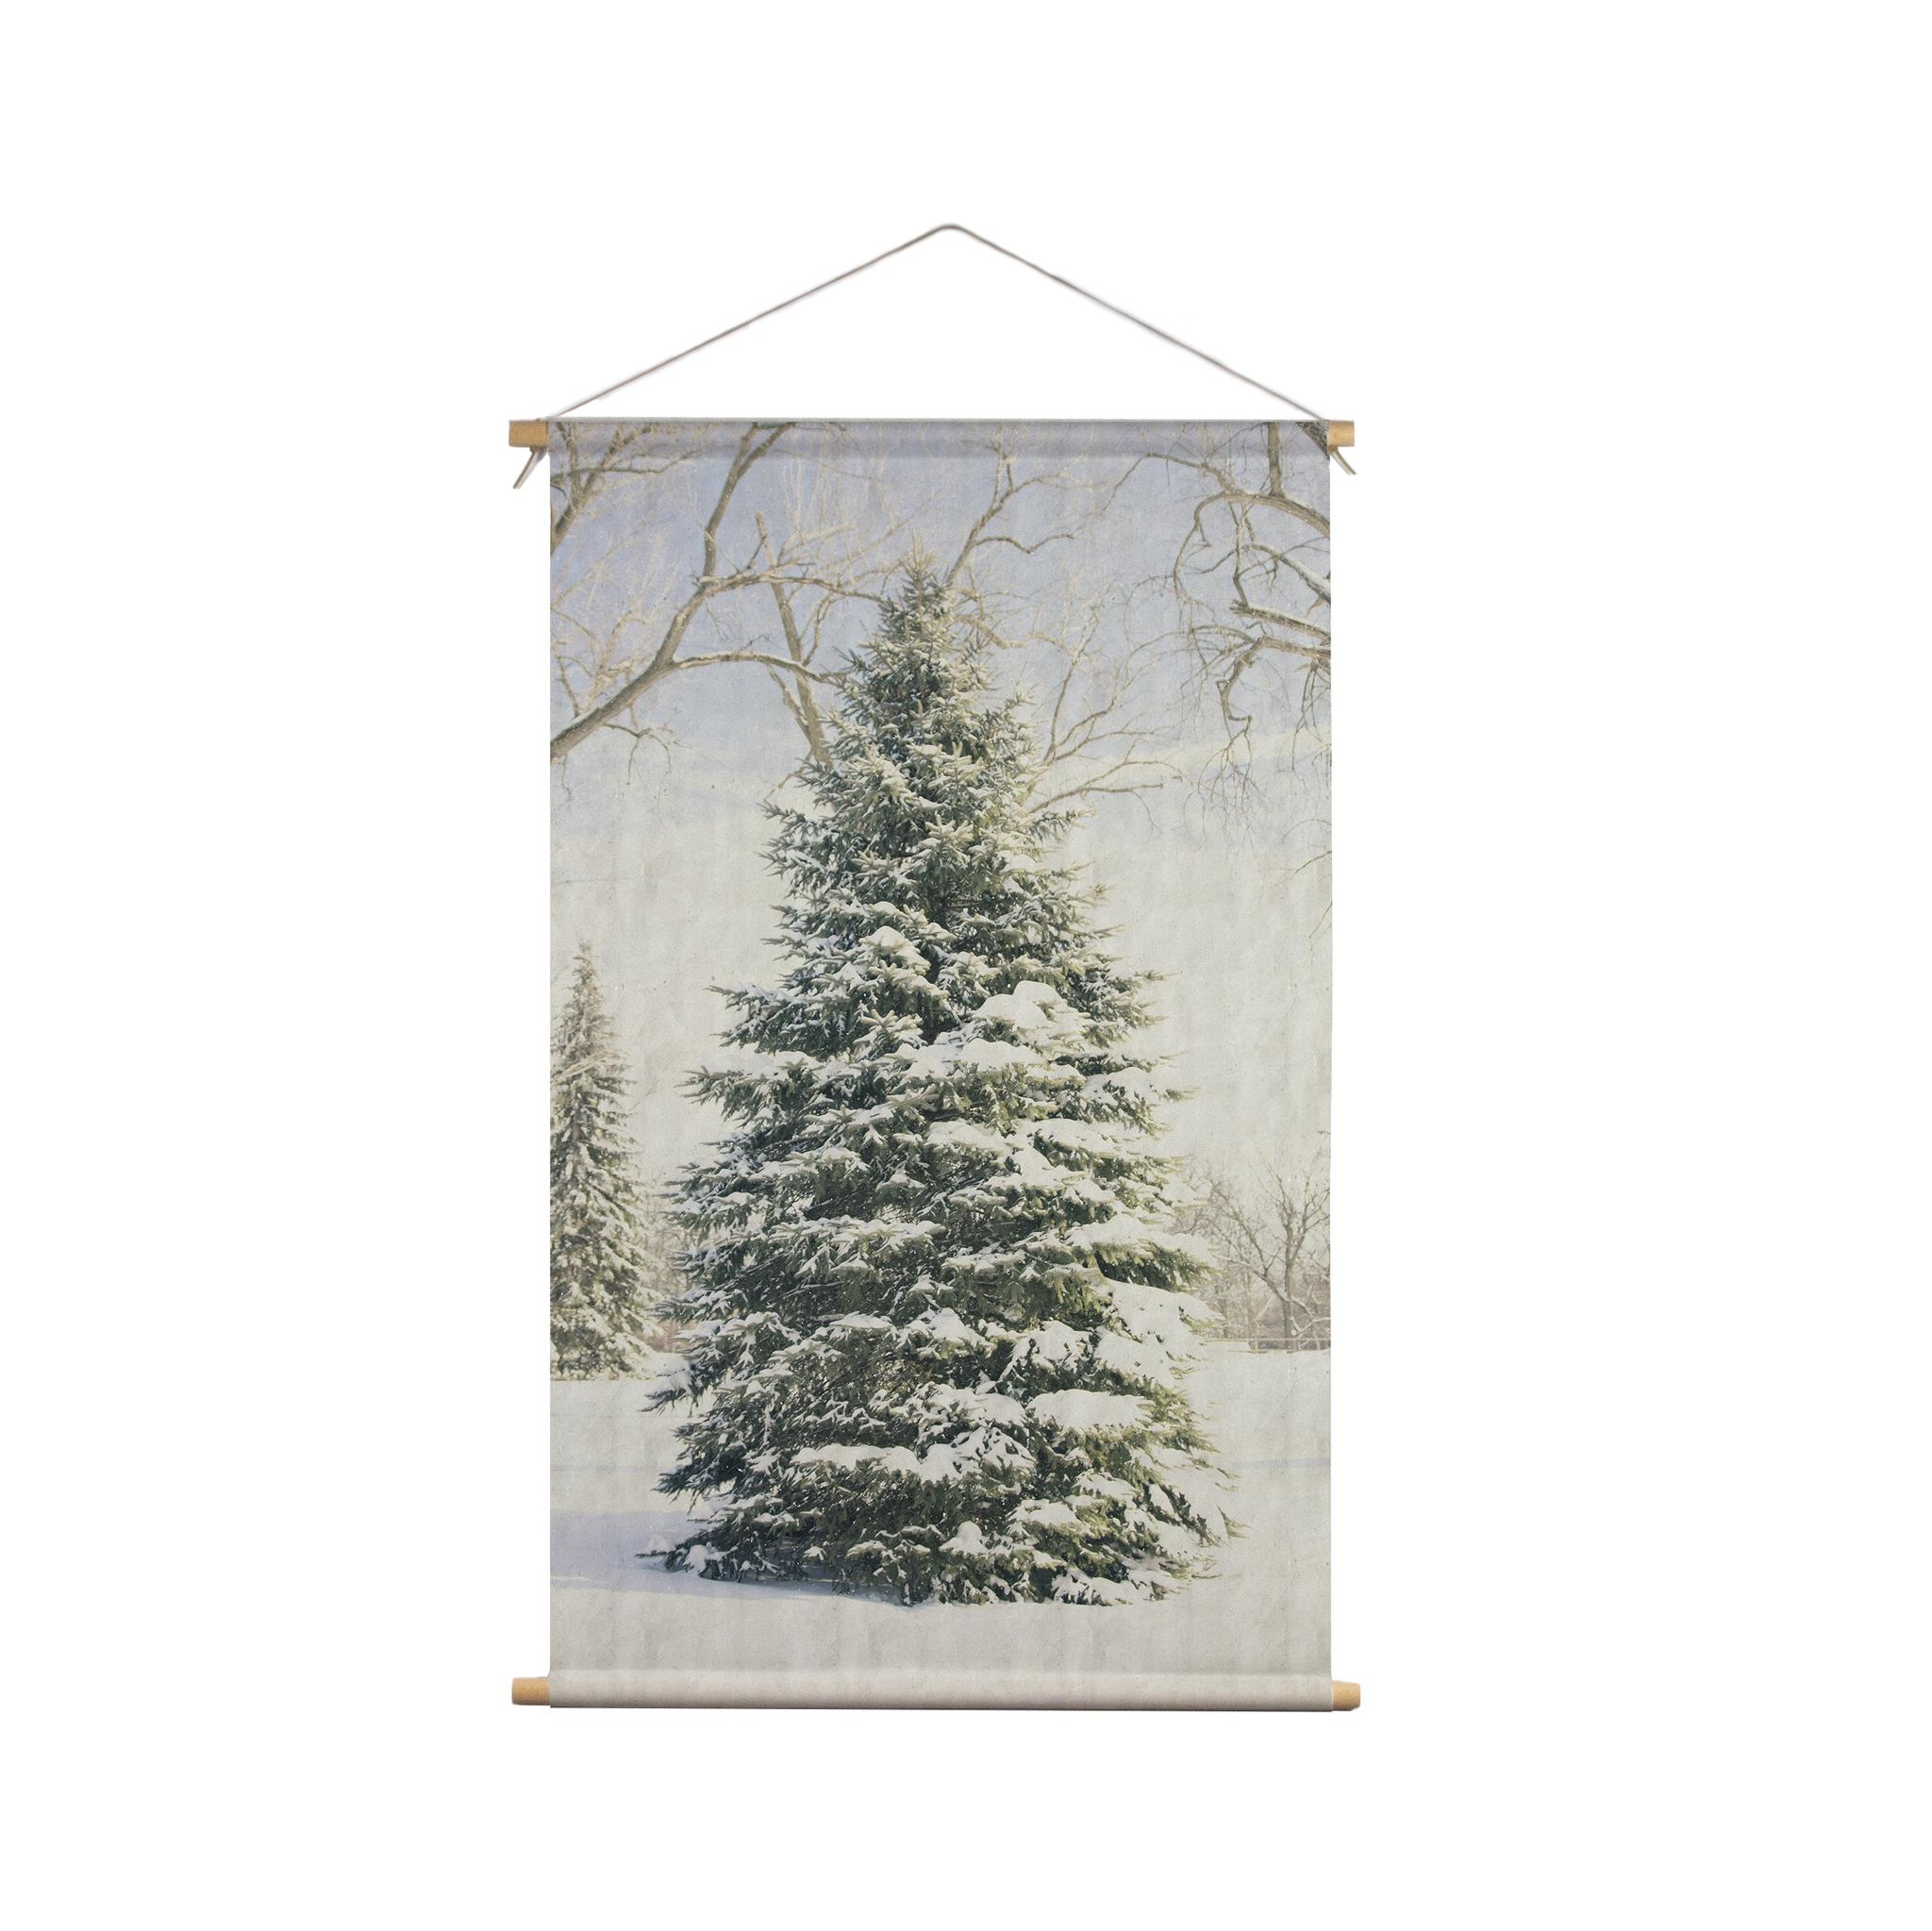 Signcraft-rotterdam_interieur-kerst-textielposter-print-kerstboom-vintage-natuur